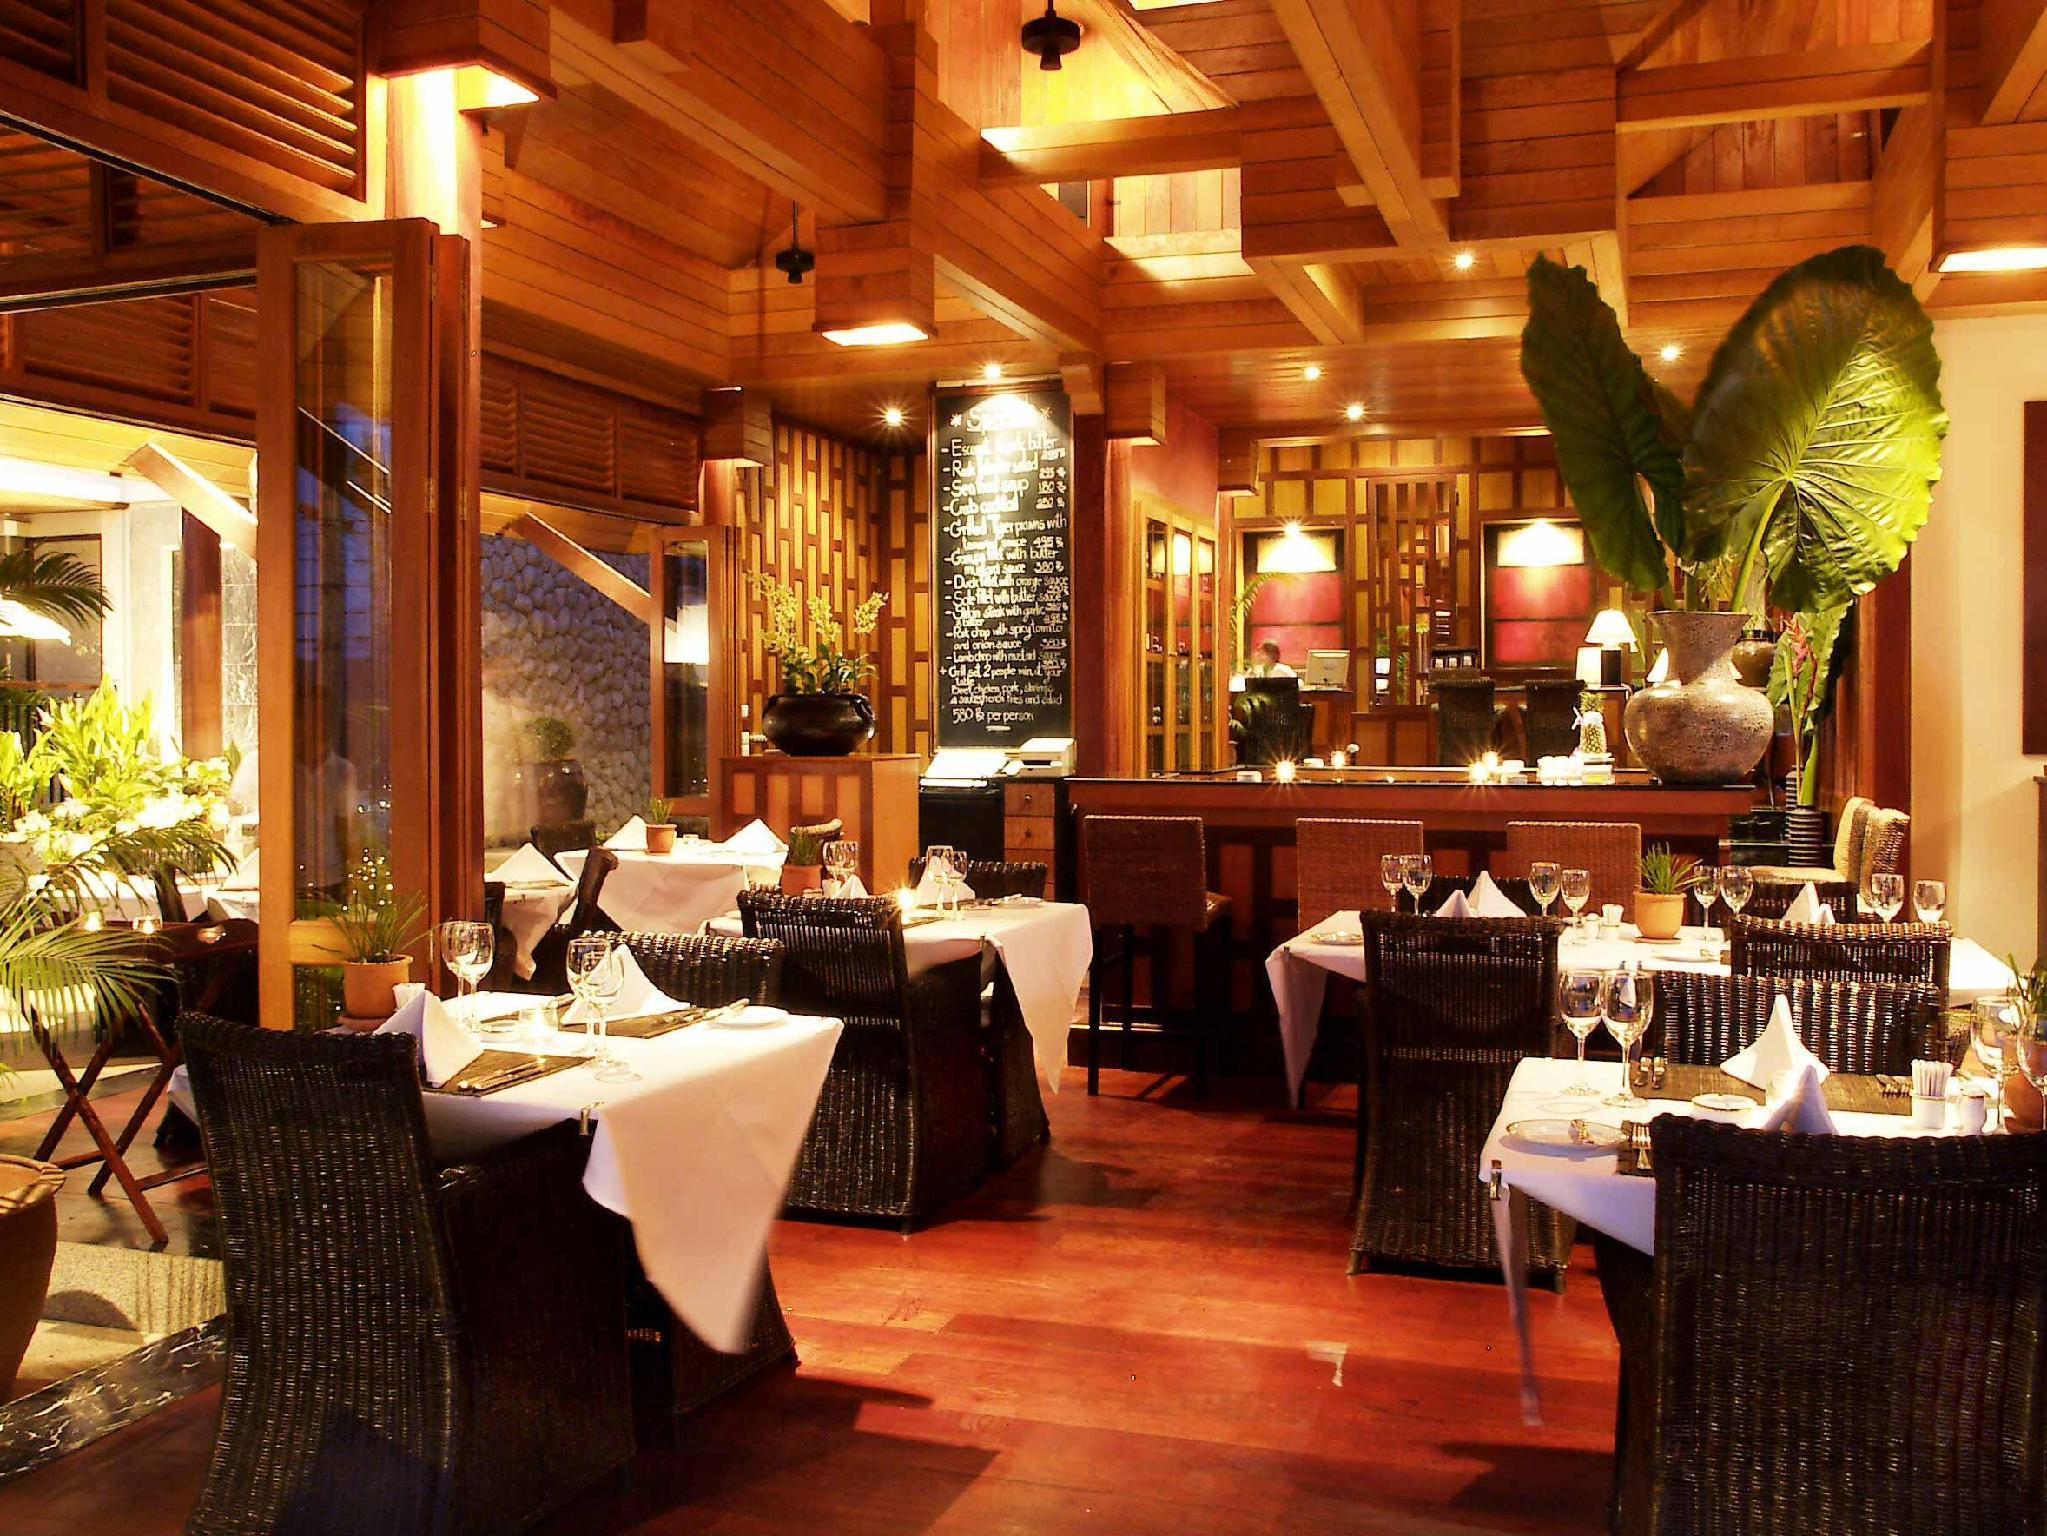 Baan Yin Dee Boutique Resort บ้านยินดี บูทิก รีสอร์ท